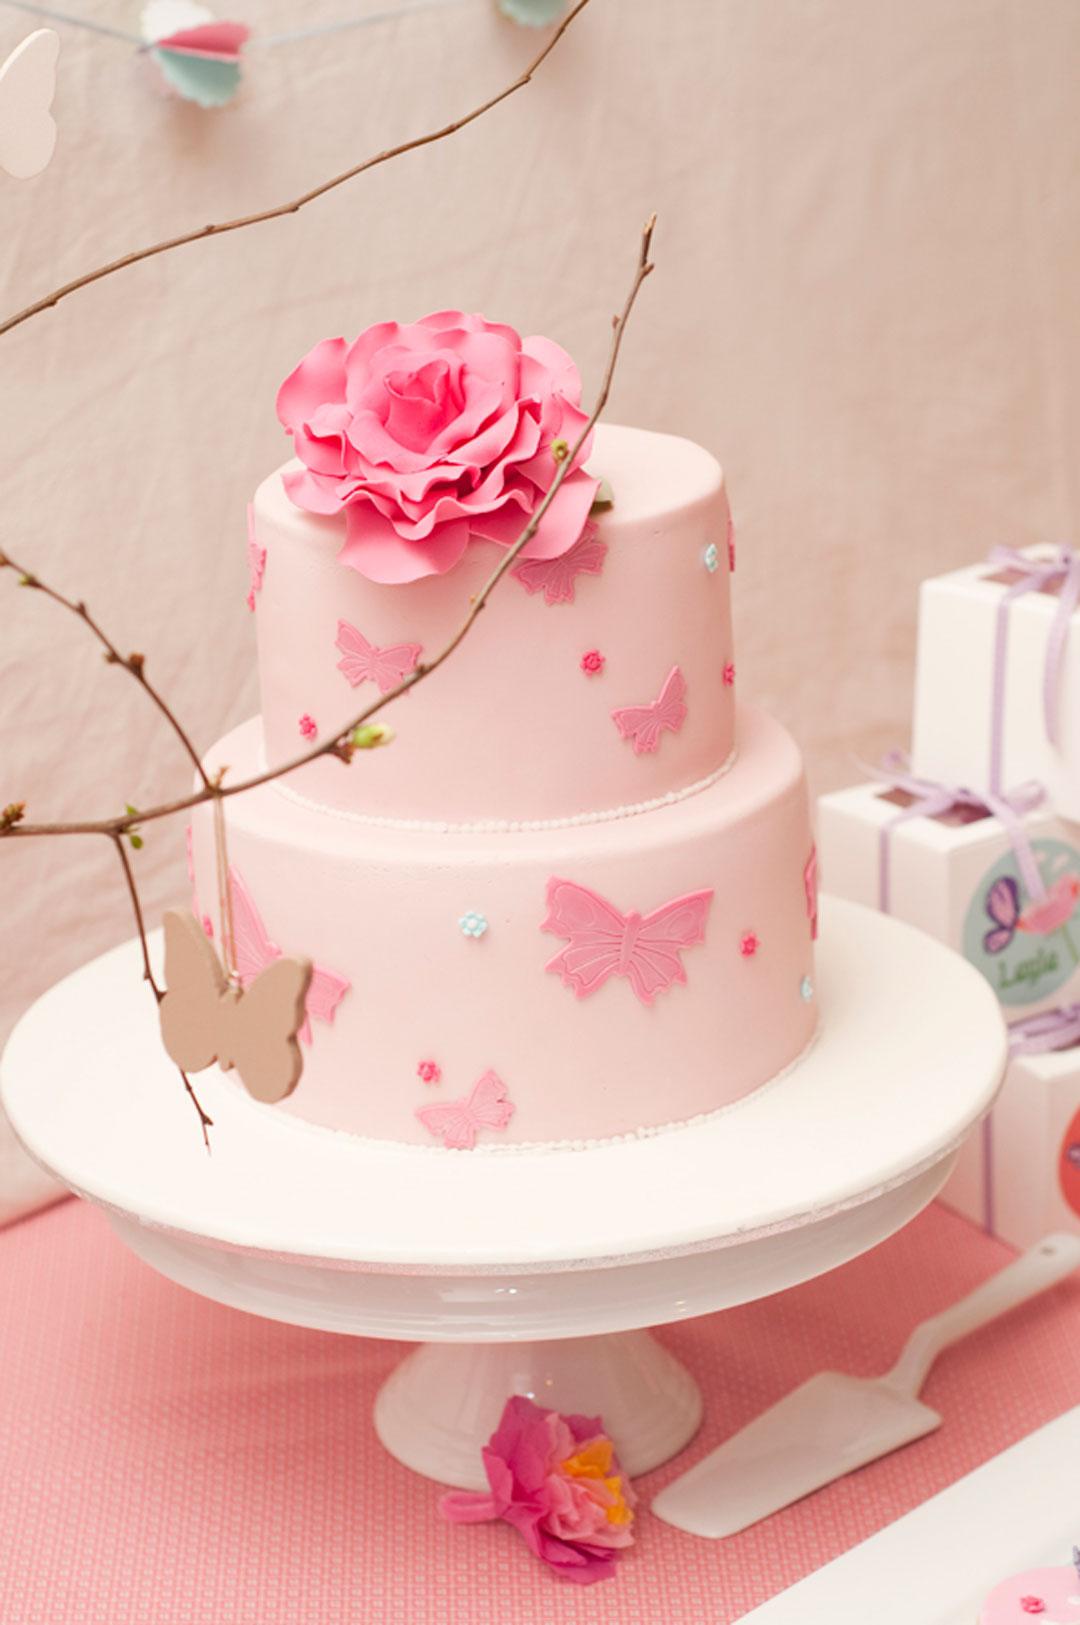 Birthday Cake Decorations Tumblr